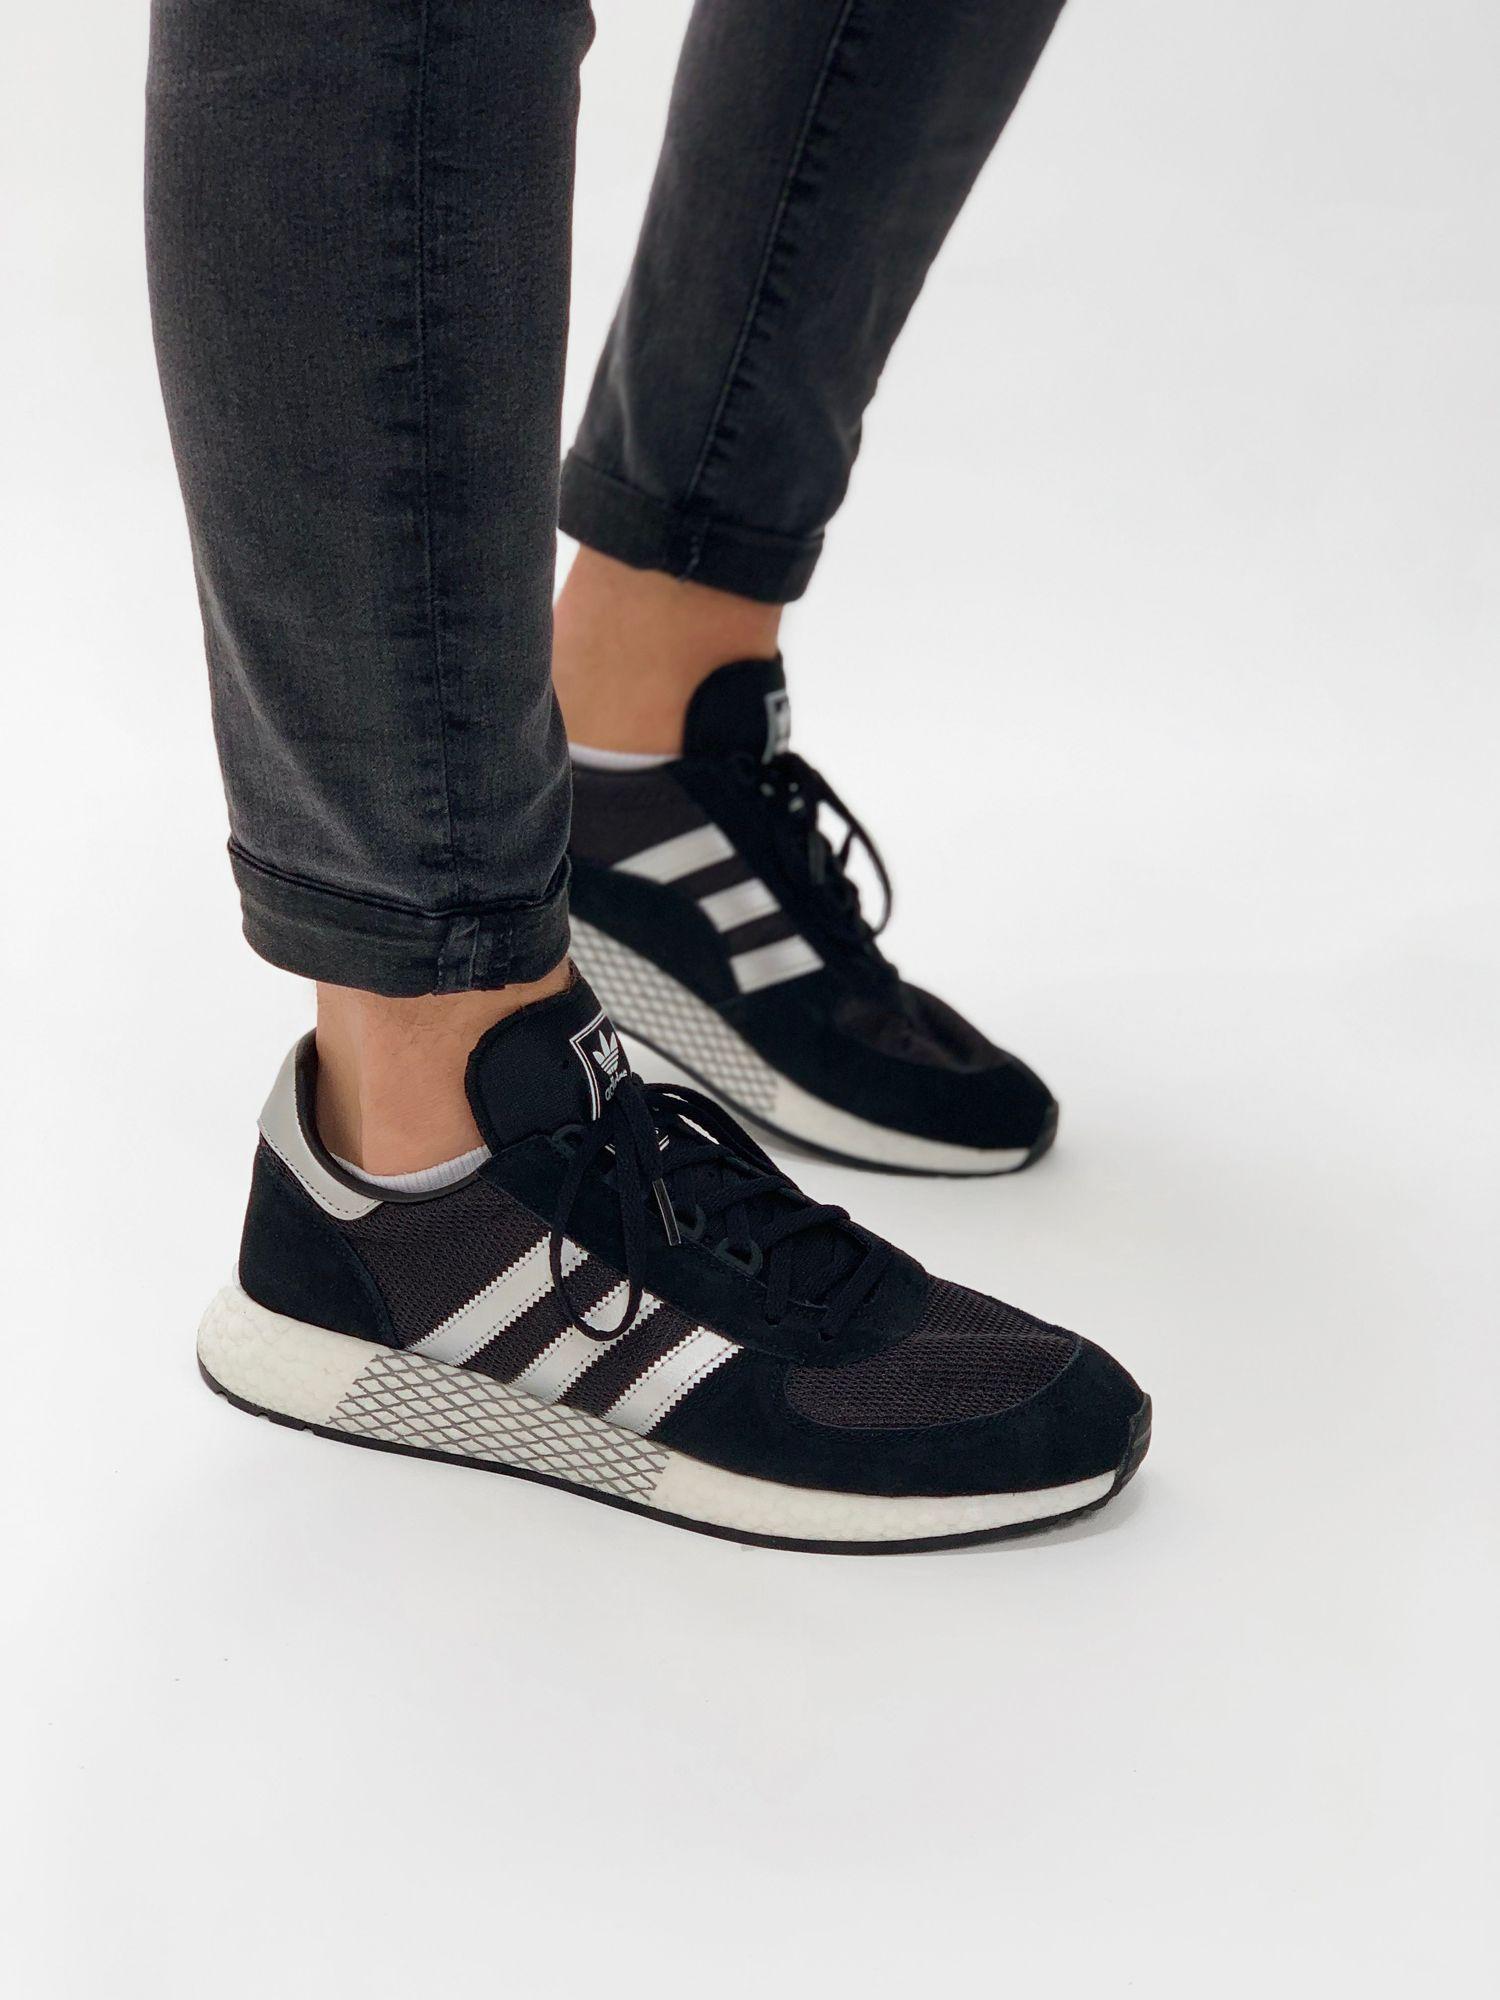 2019 Modische Casual Schuhe Herren adidas Originals